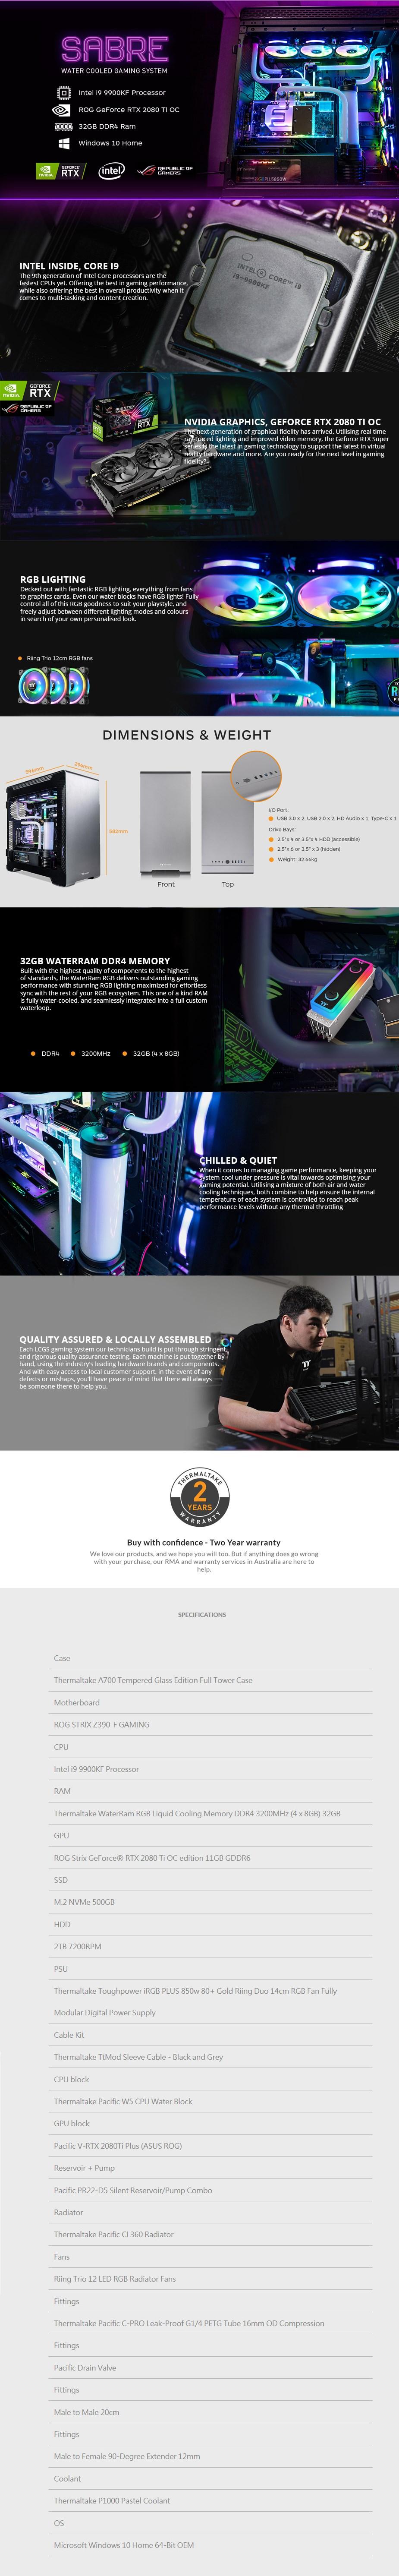 Thermaltake LCGS Sabre Gaming PC i9-9900KF 32GB 500GB+2TB RTX2080Ti W10H - Overview 1